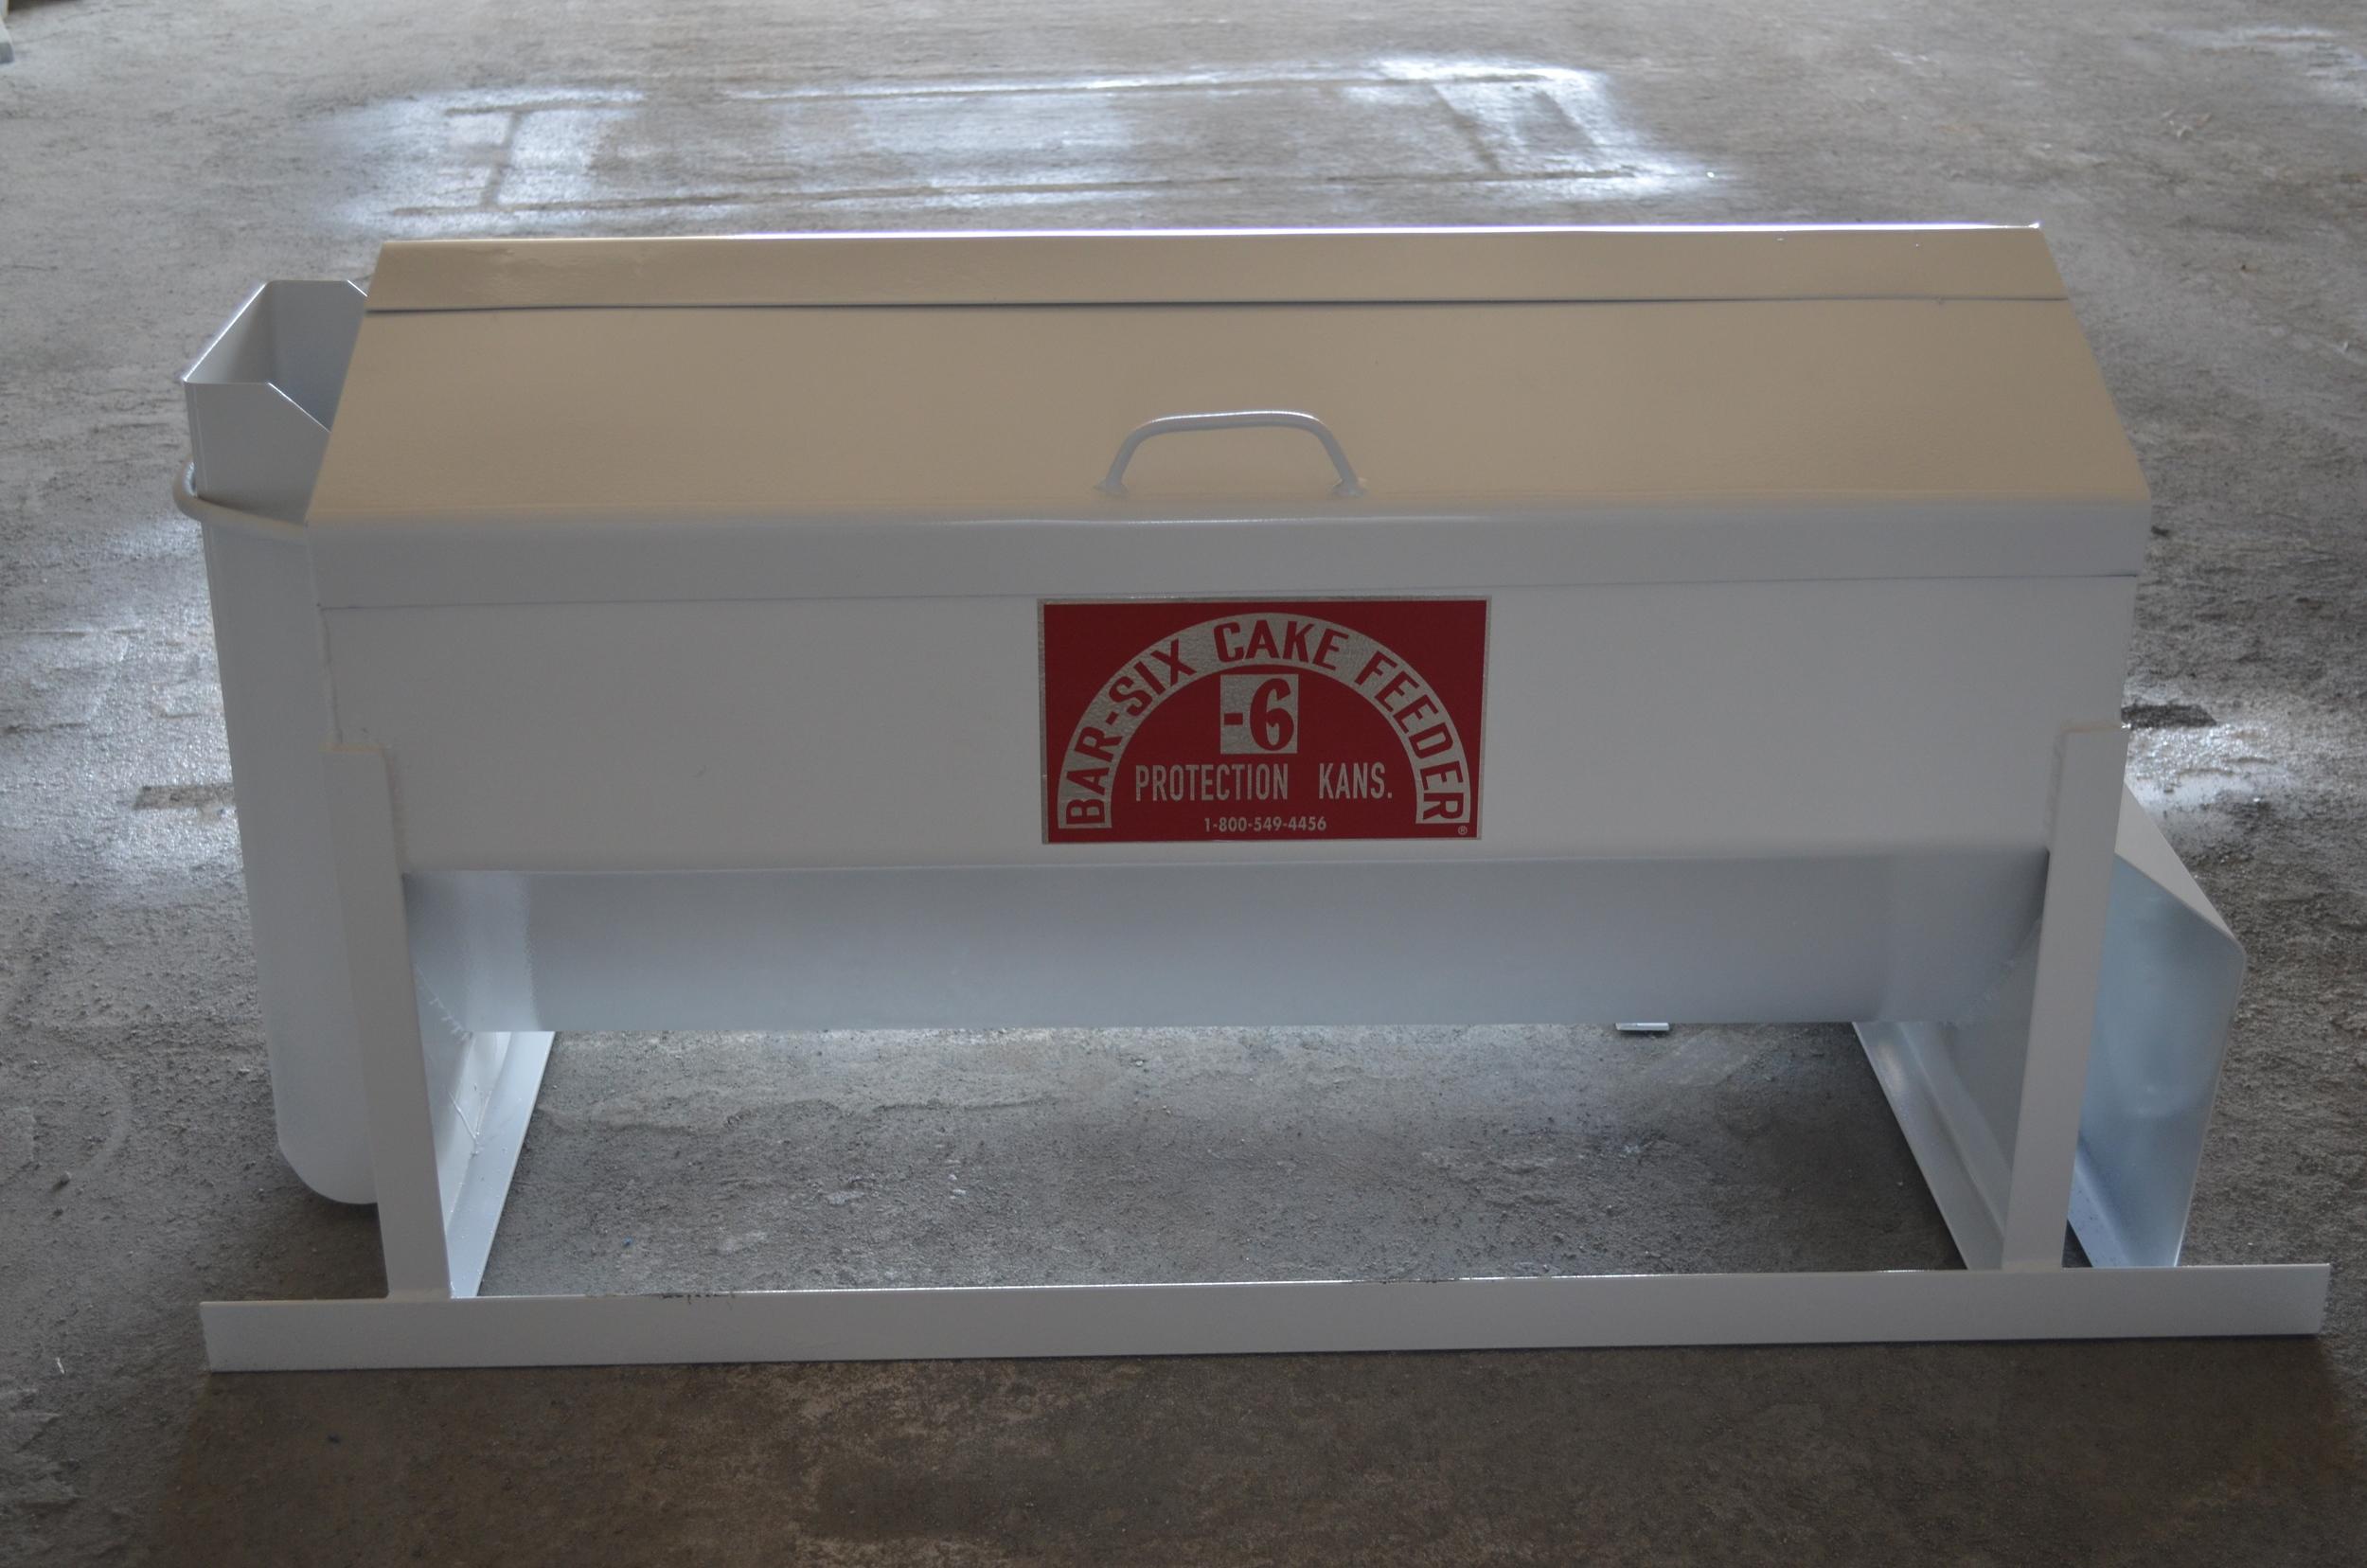 bar 6 cake feeders wiring diagram feed dispensers     bar 6  feed dispensers     bar 6